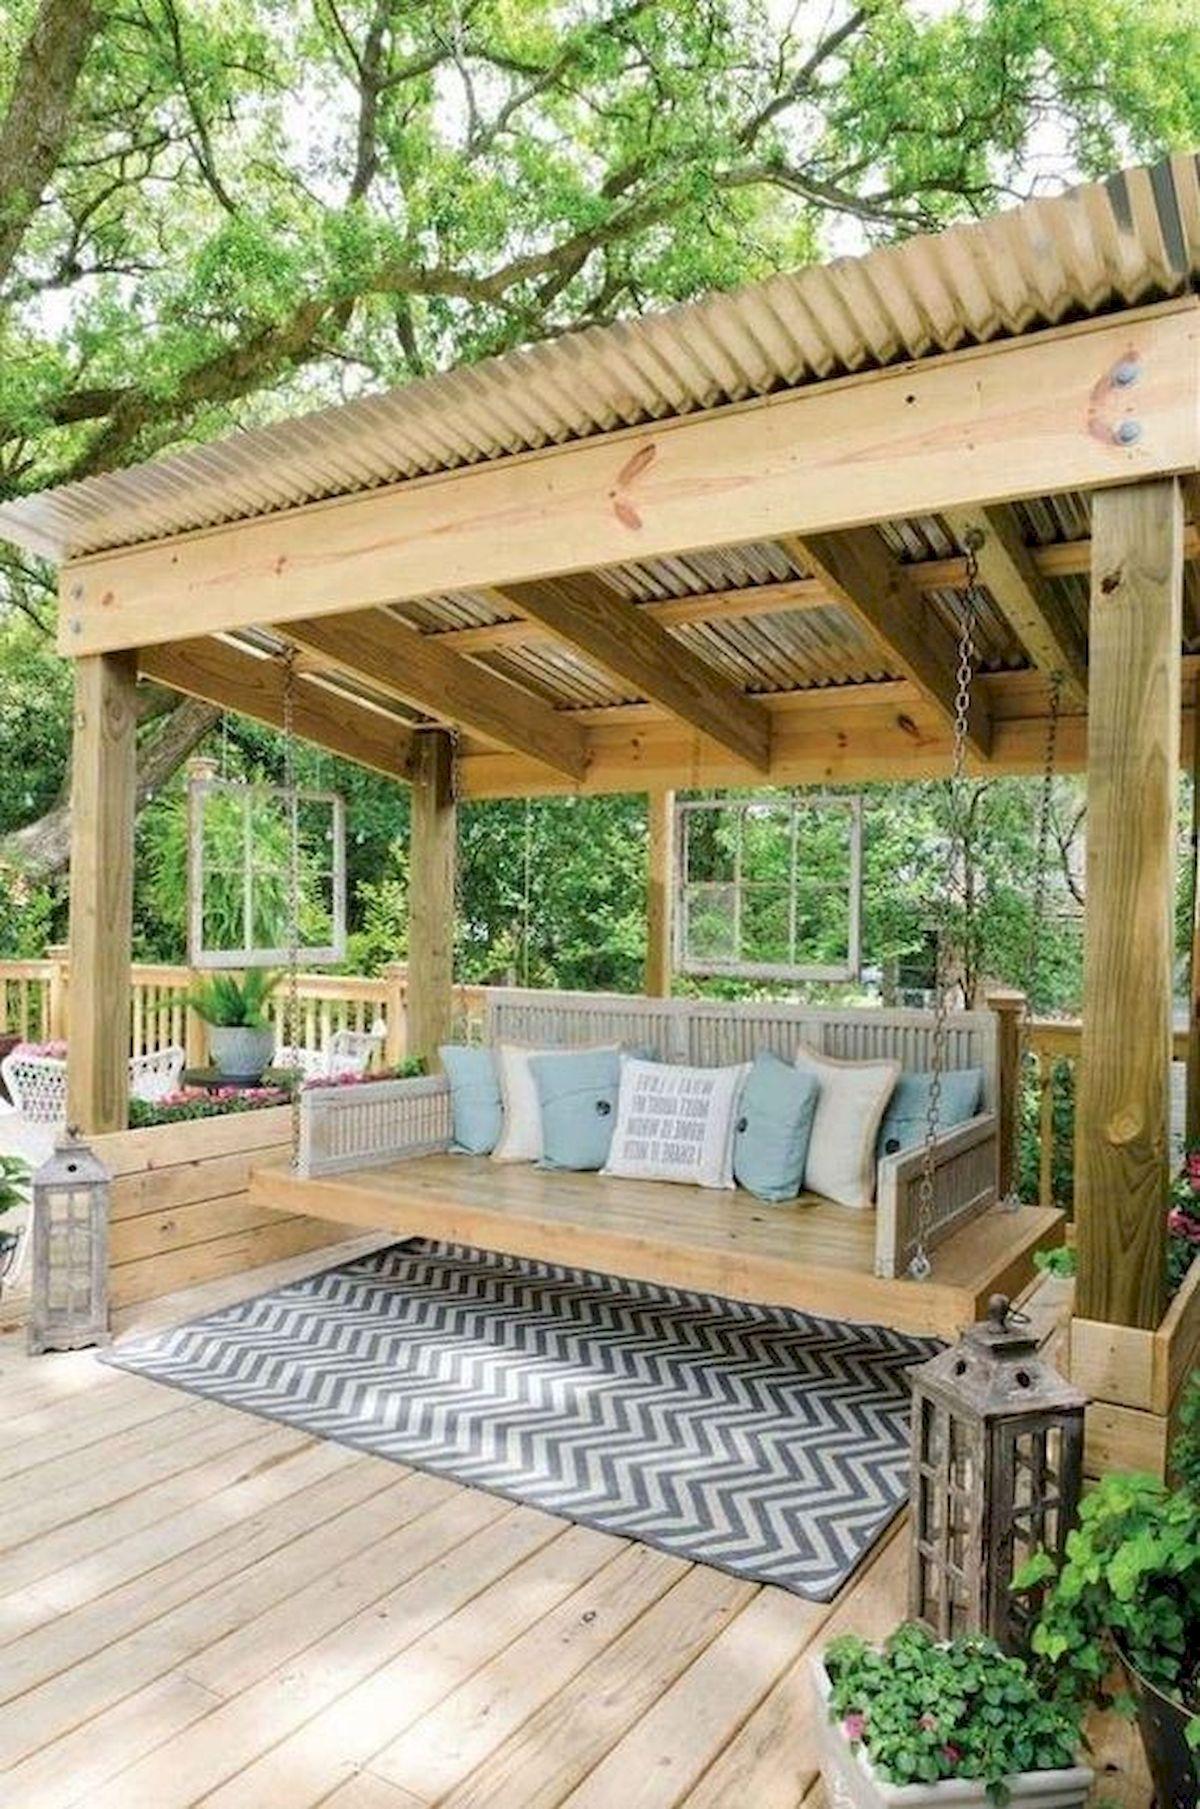 50 Best DIY Backyard Patio And Decking Design Ideas (38)